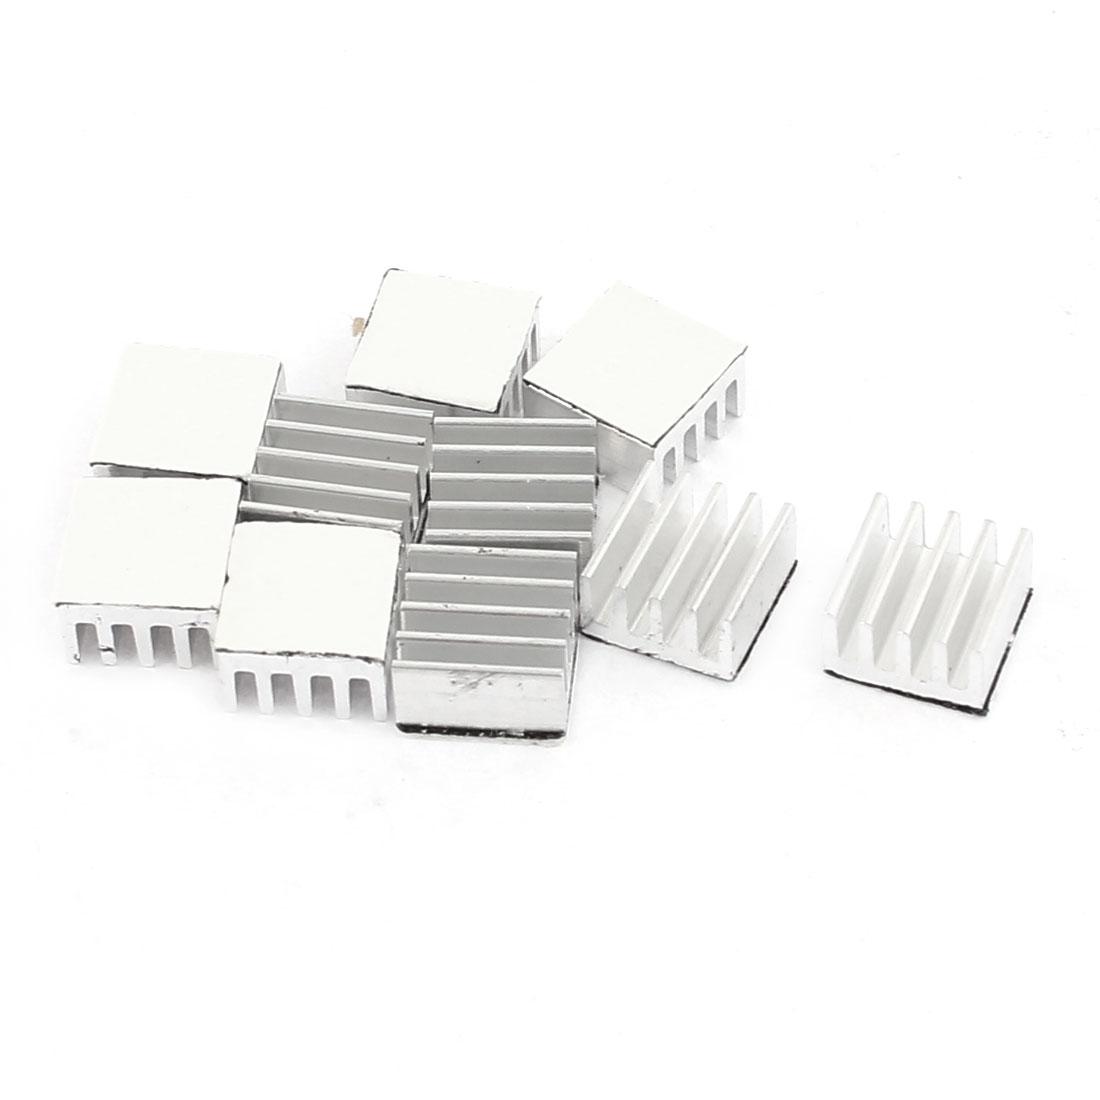 10 Pcs Square Aluminum Heatsink Radiator Cooling Cooler Fin 9x9x5mm Silver Tone